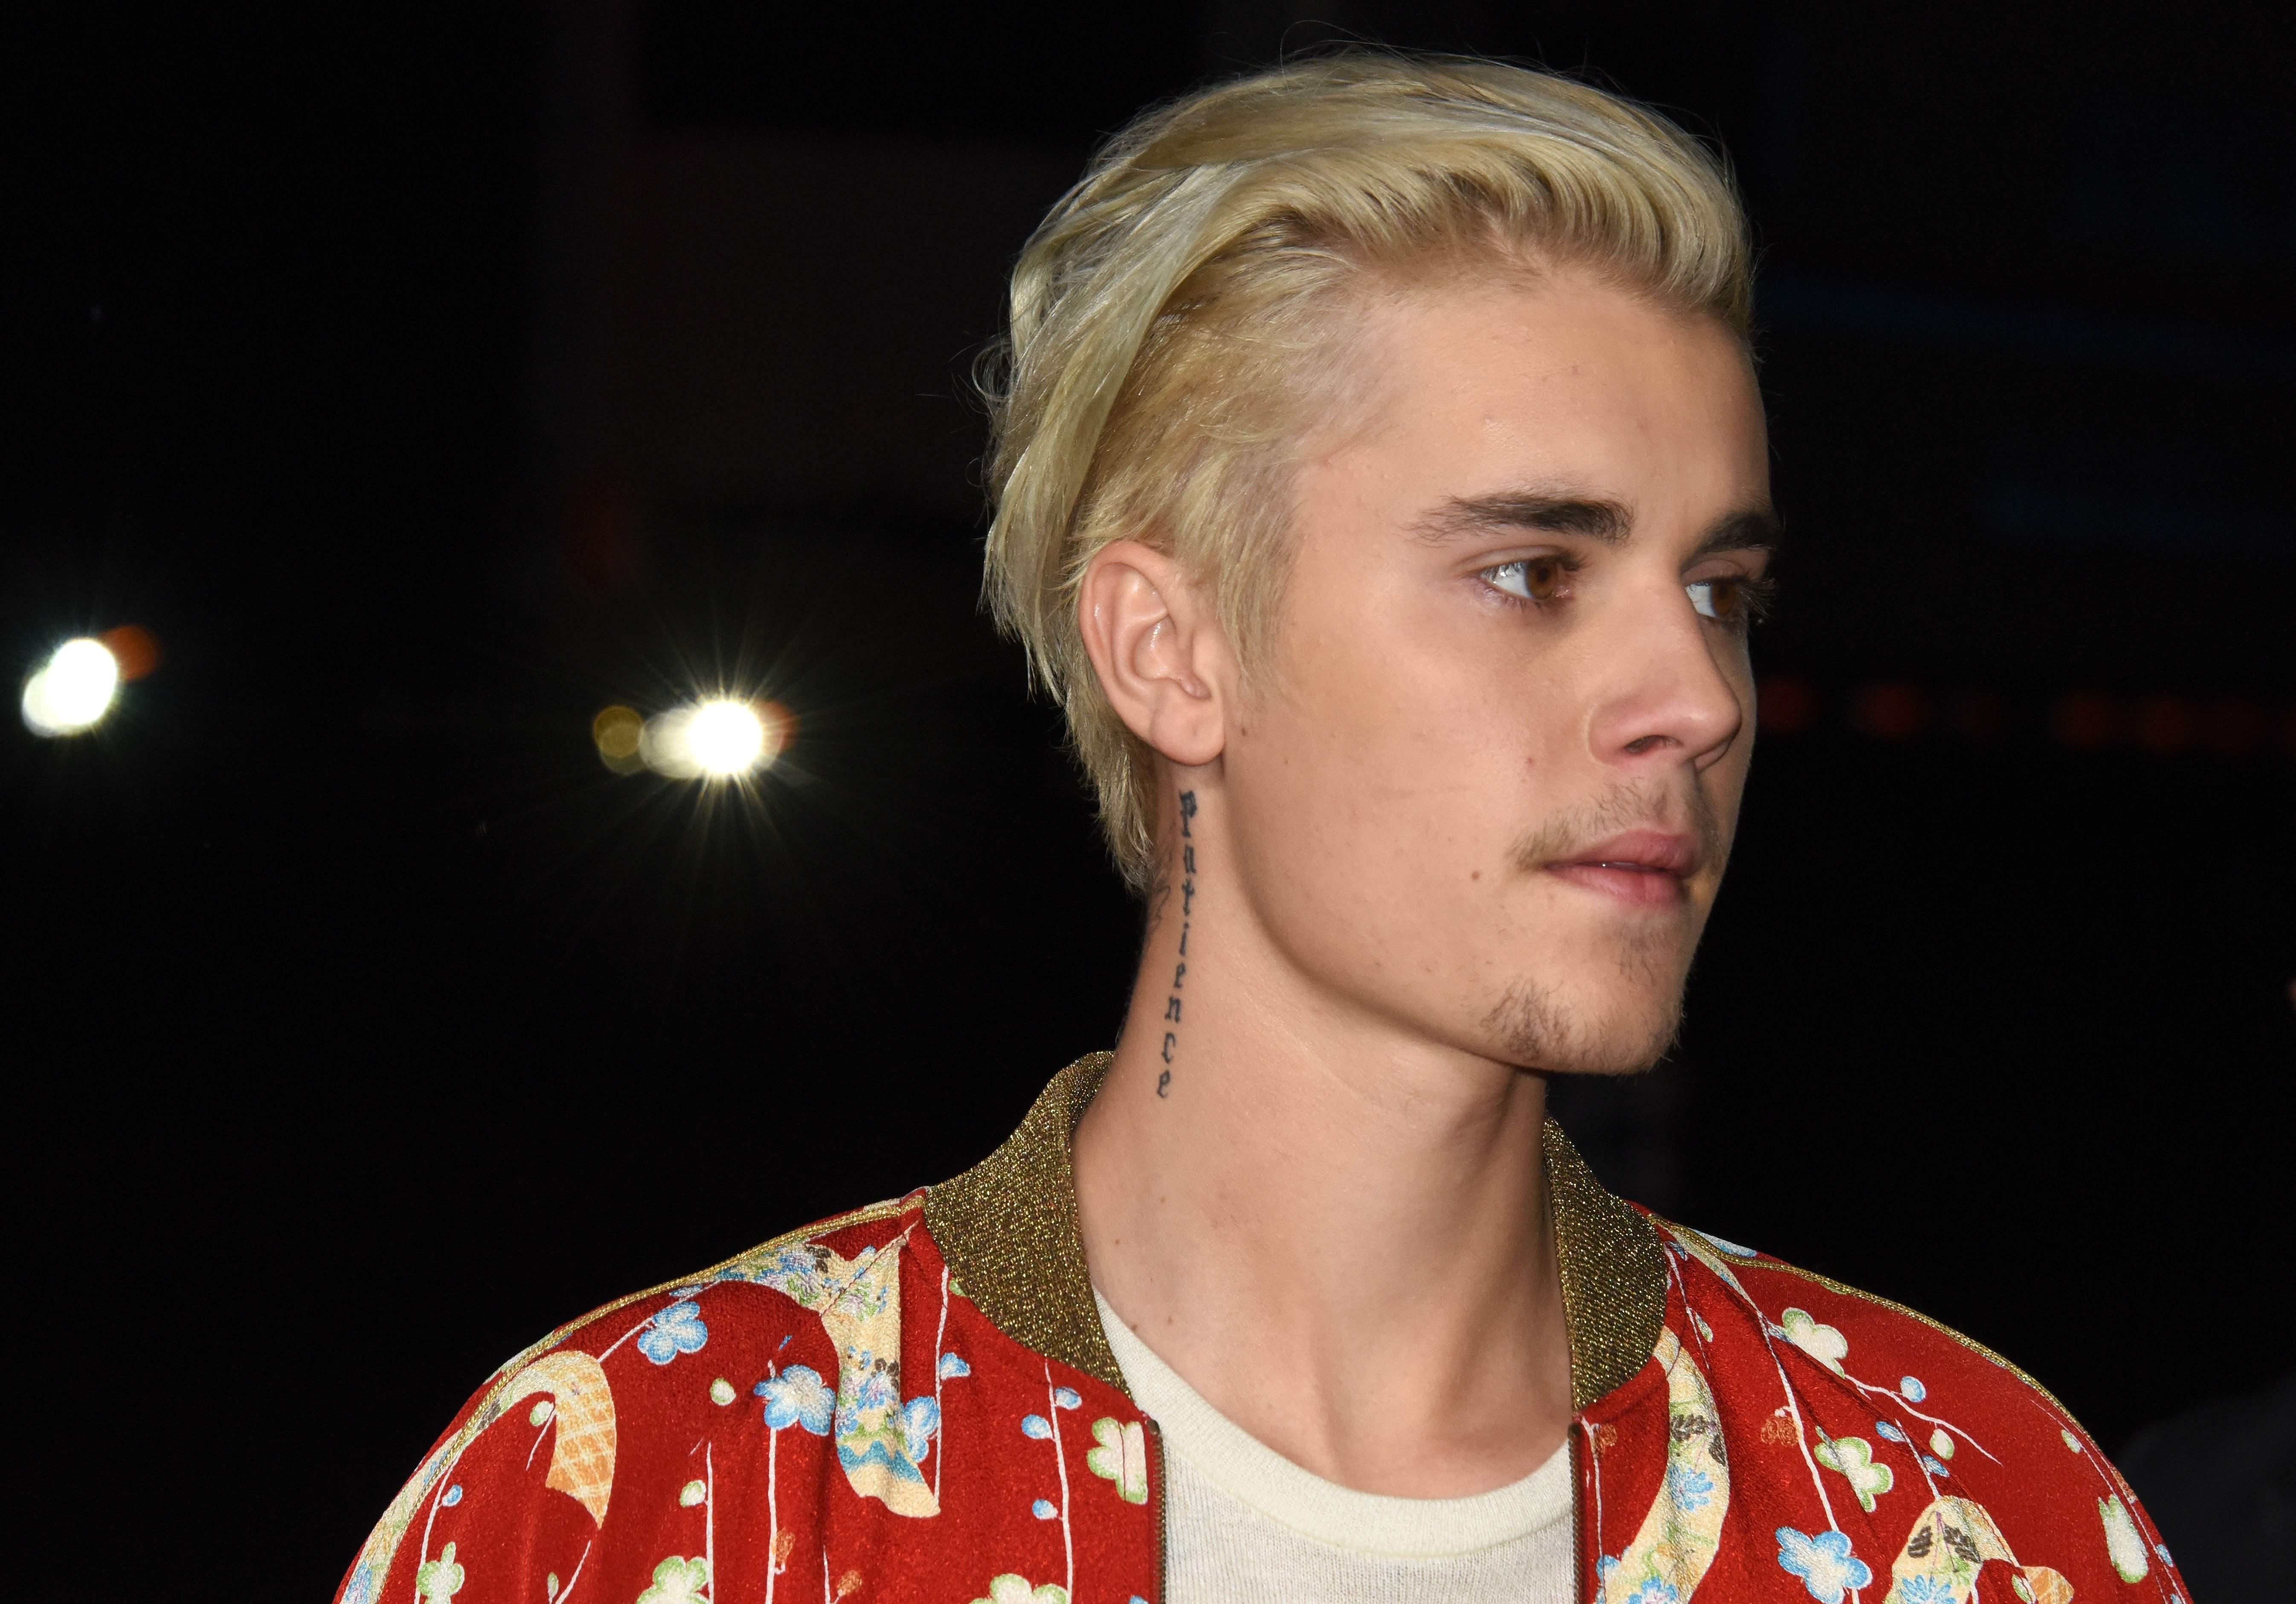 Justin Bieber asks for fans' prayers after revealing he's been 'struggling a lot'